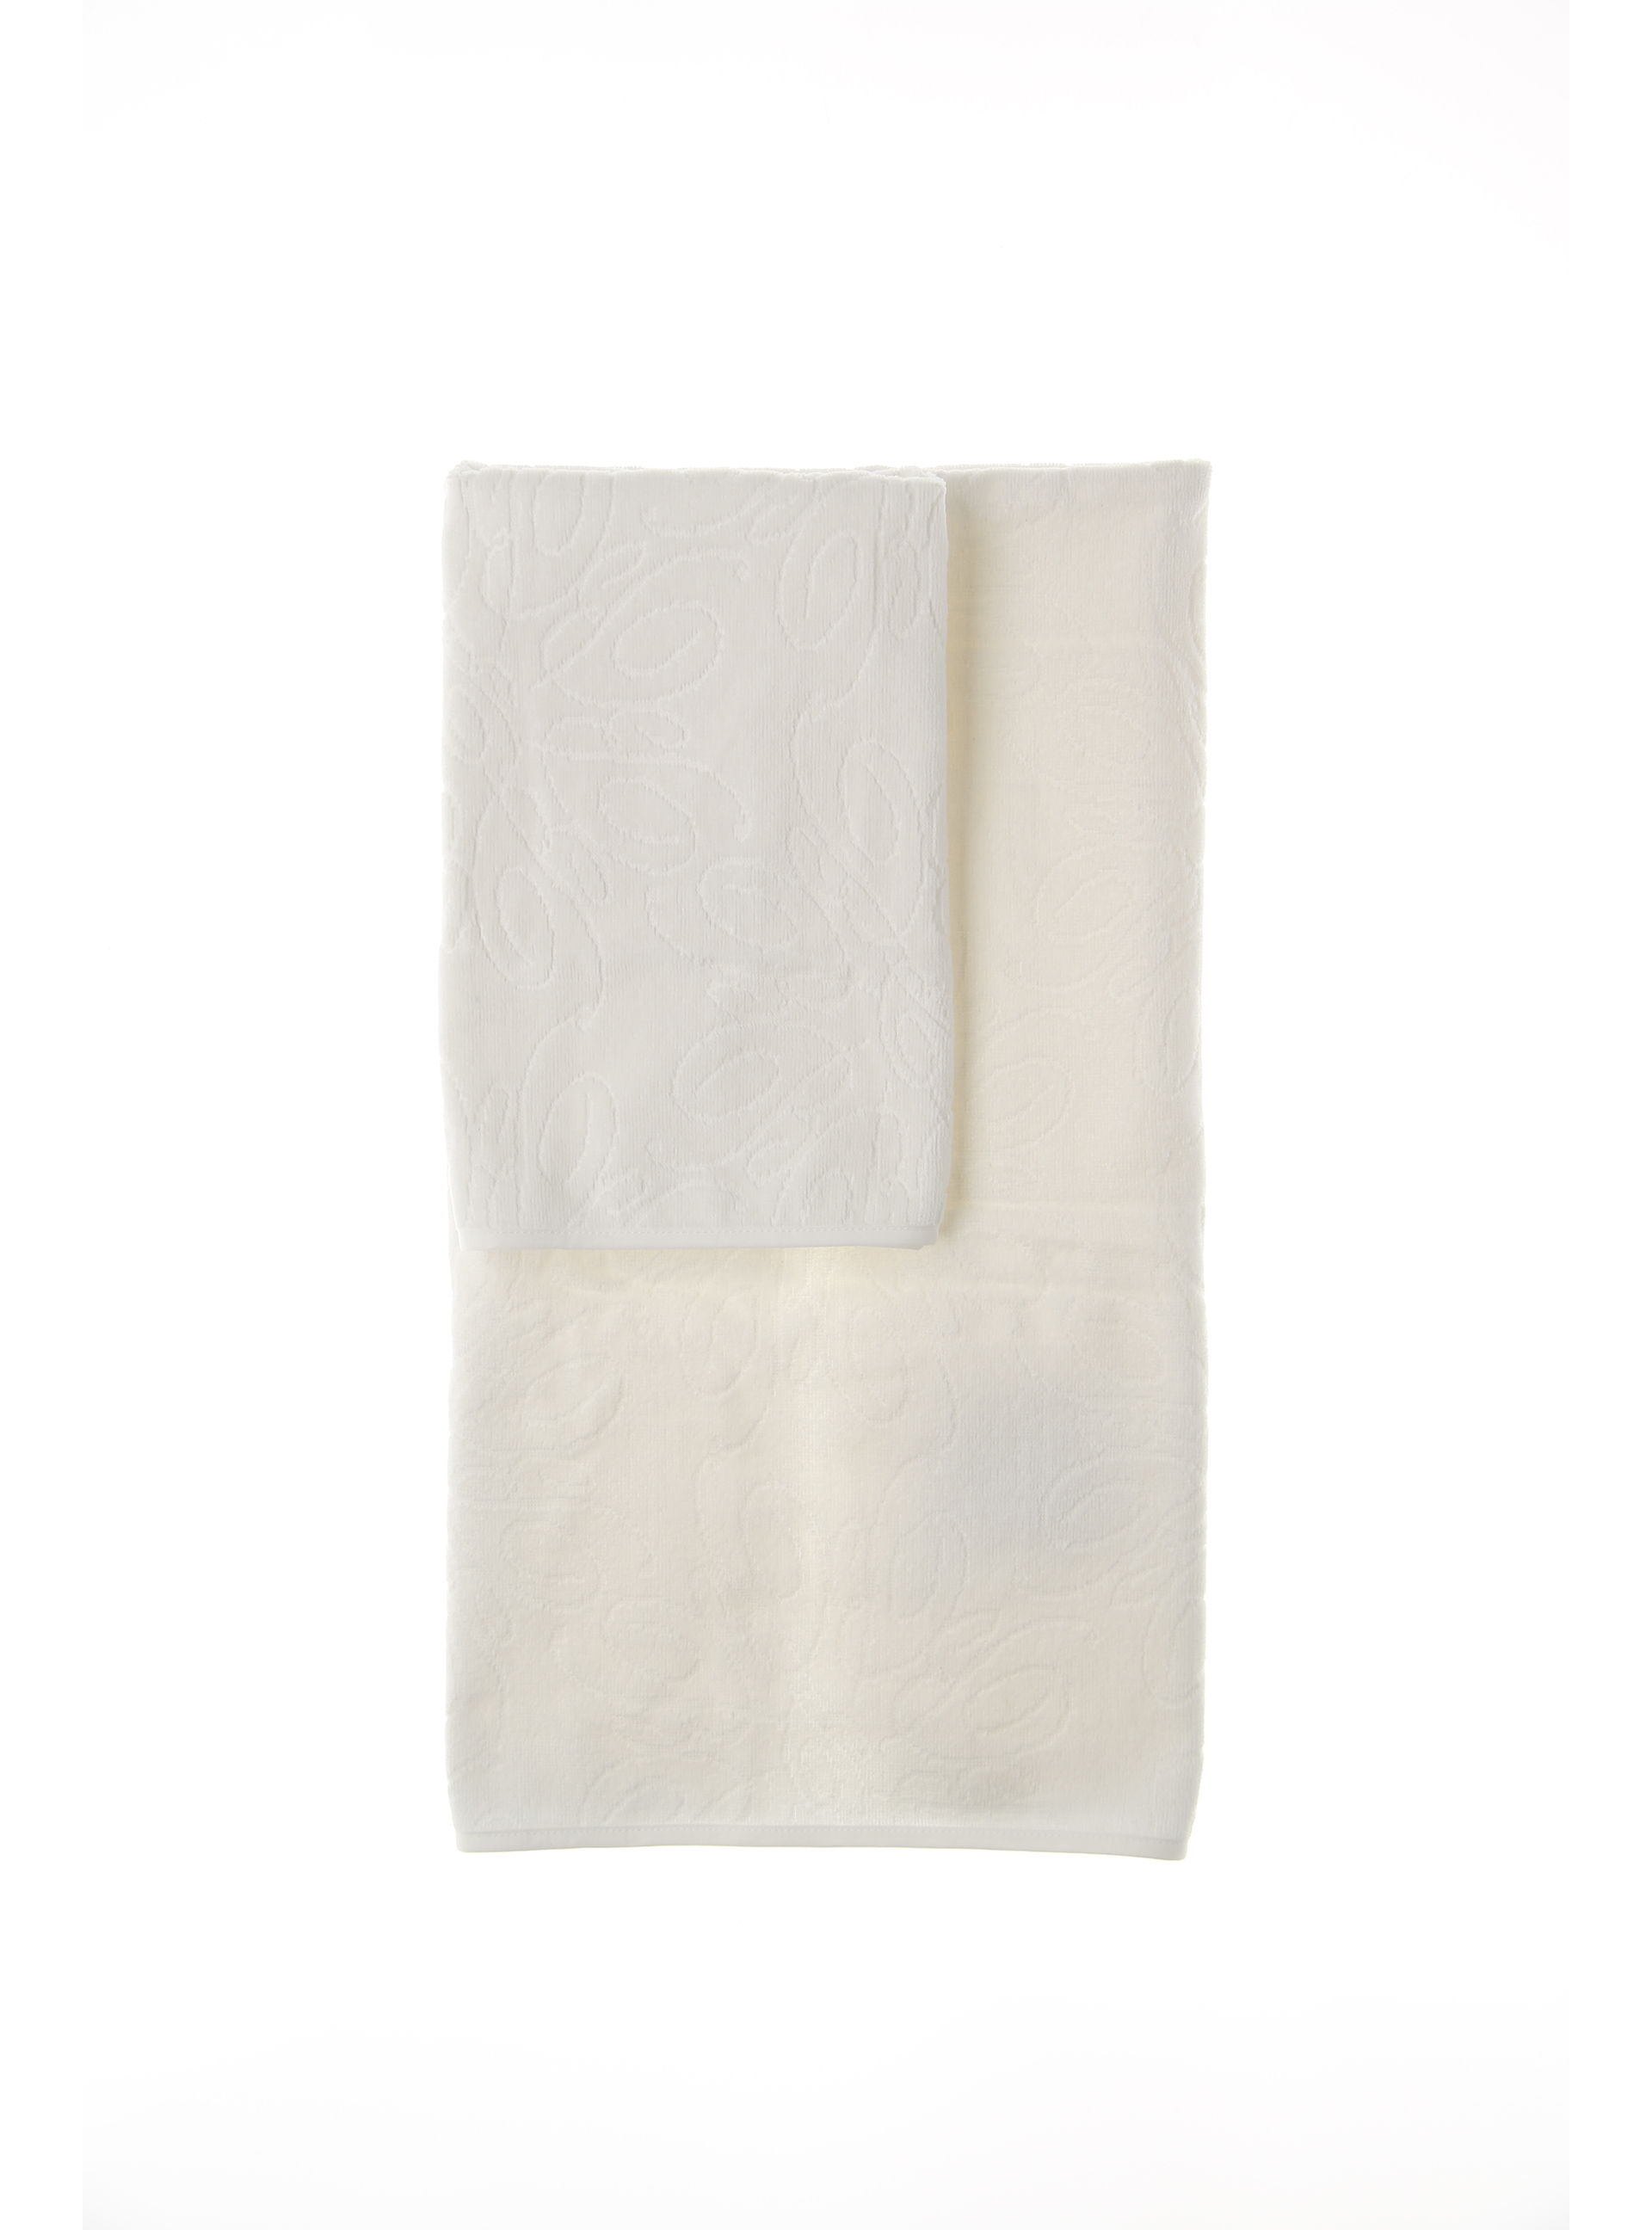 Blumarine bon -10% bathroom accessories home bianco | Sorelle Ramonda